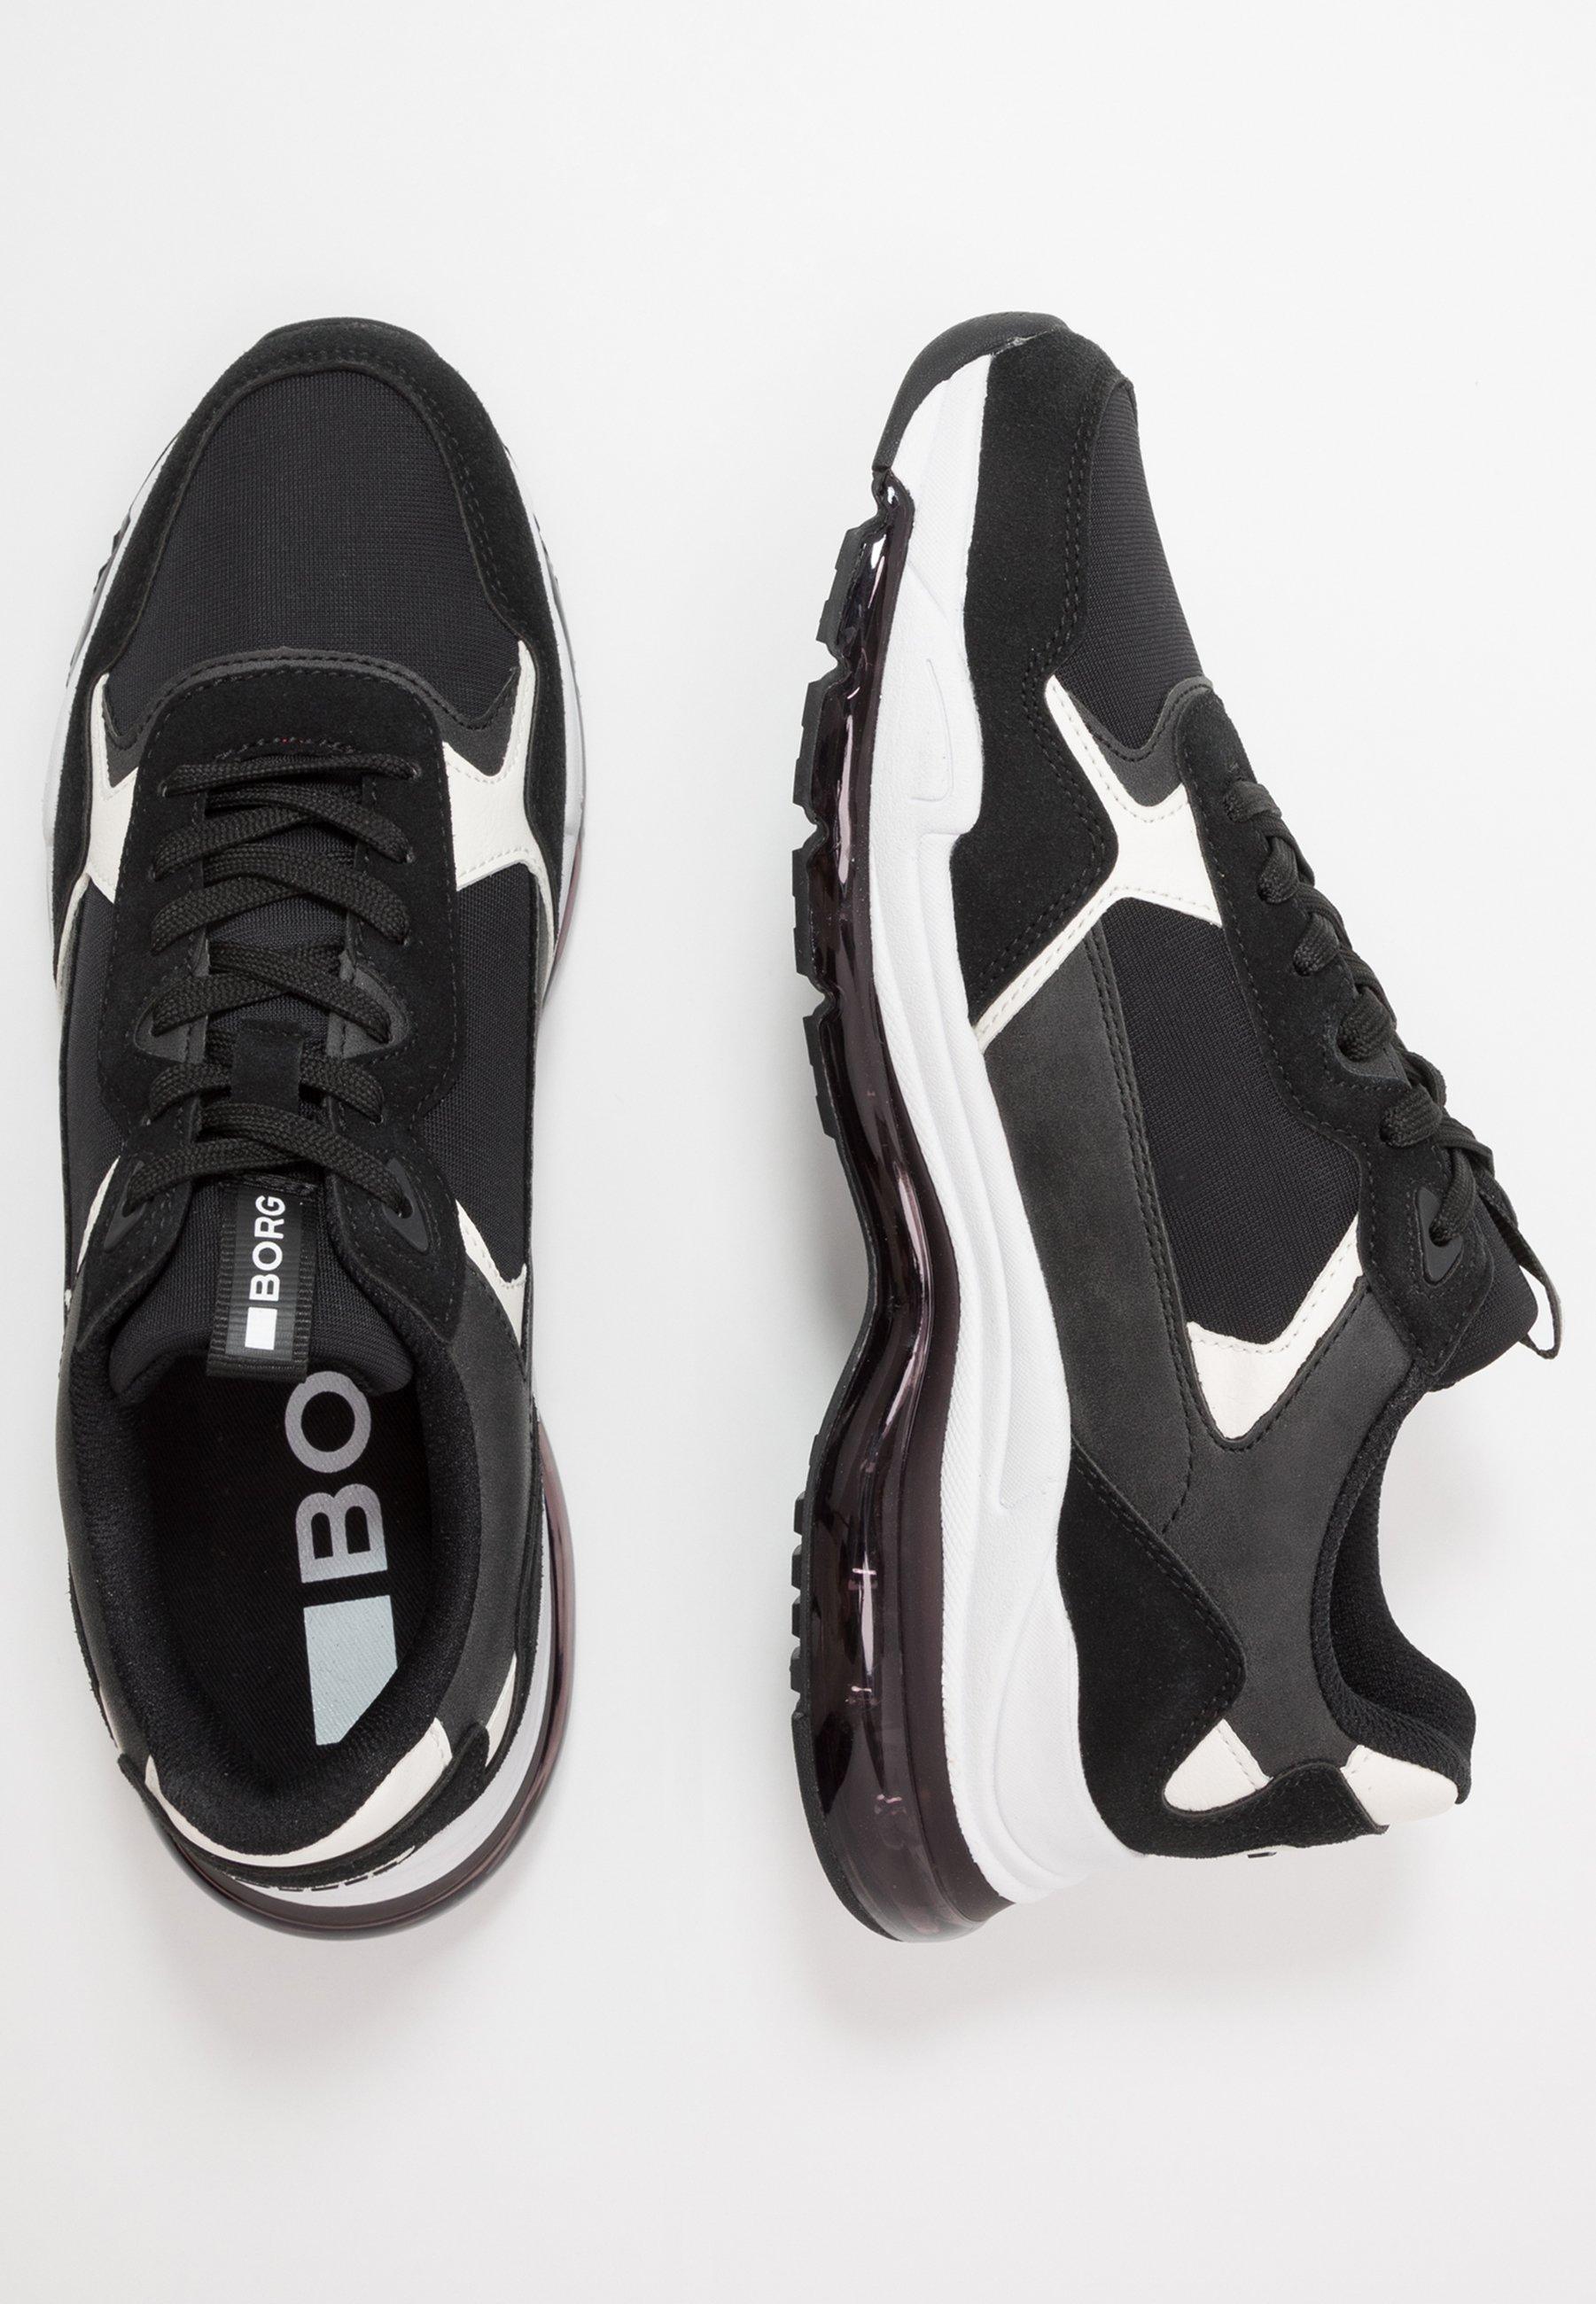 Björn Borg X510 - Sneakers - black/white